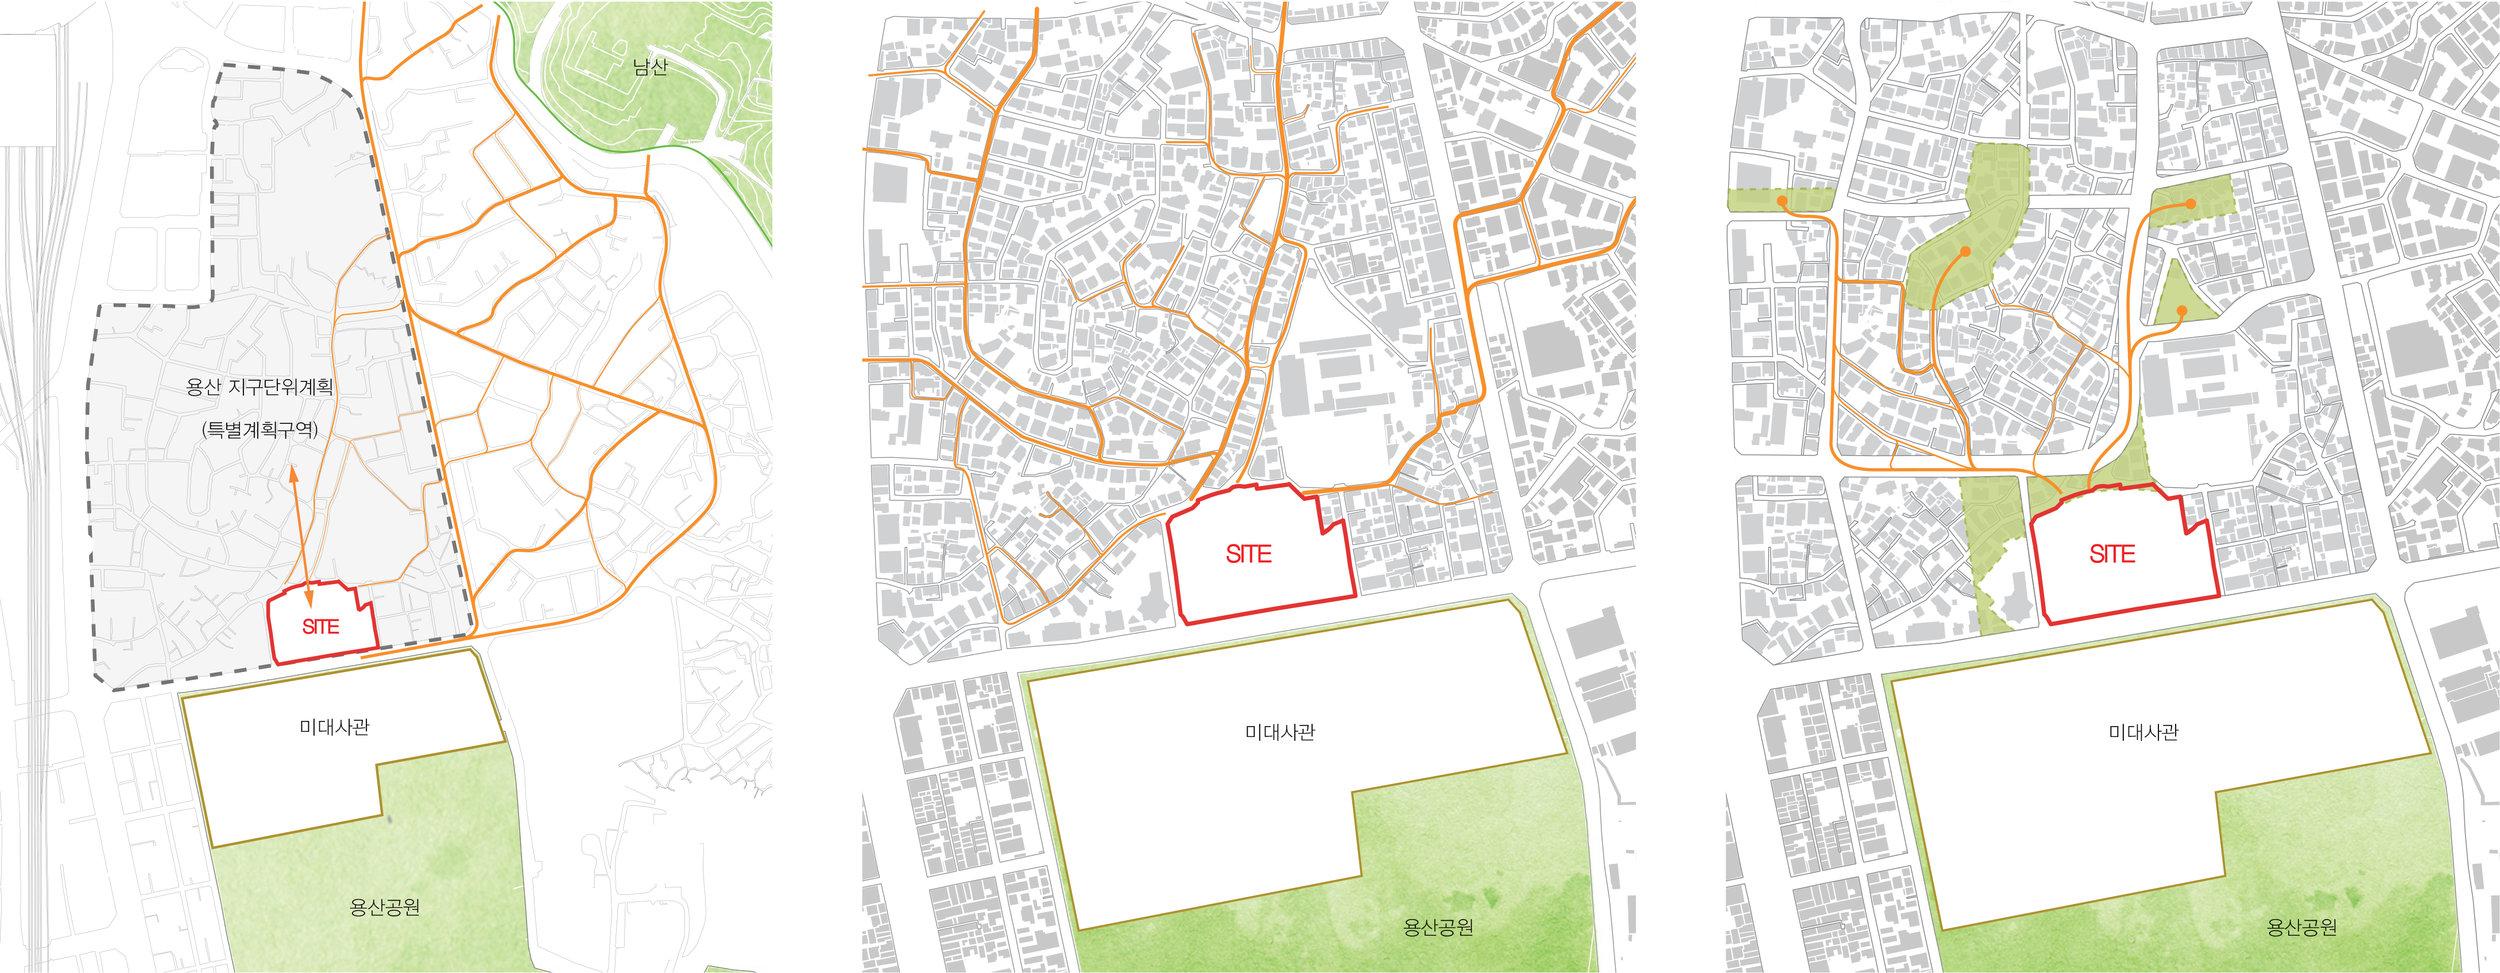 Urban Diagram.jpg